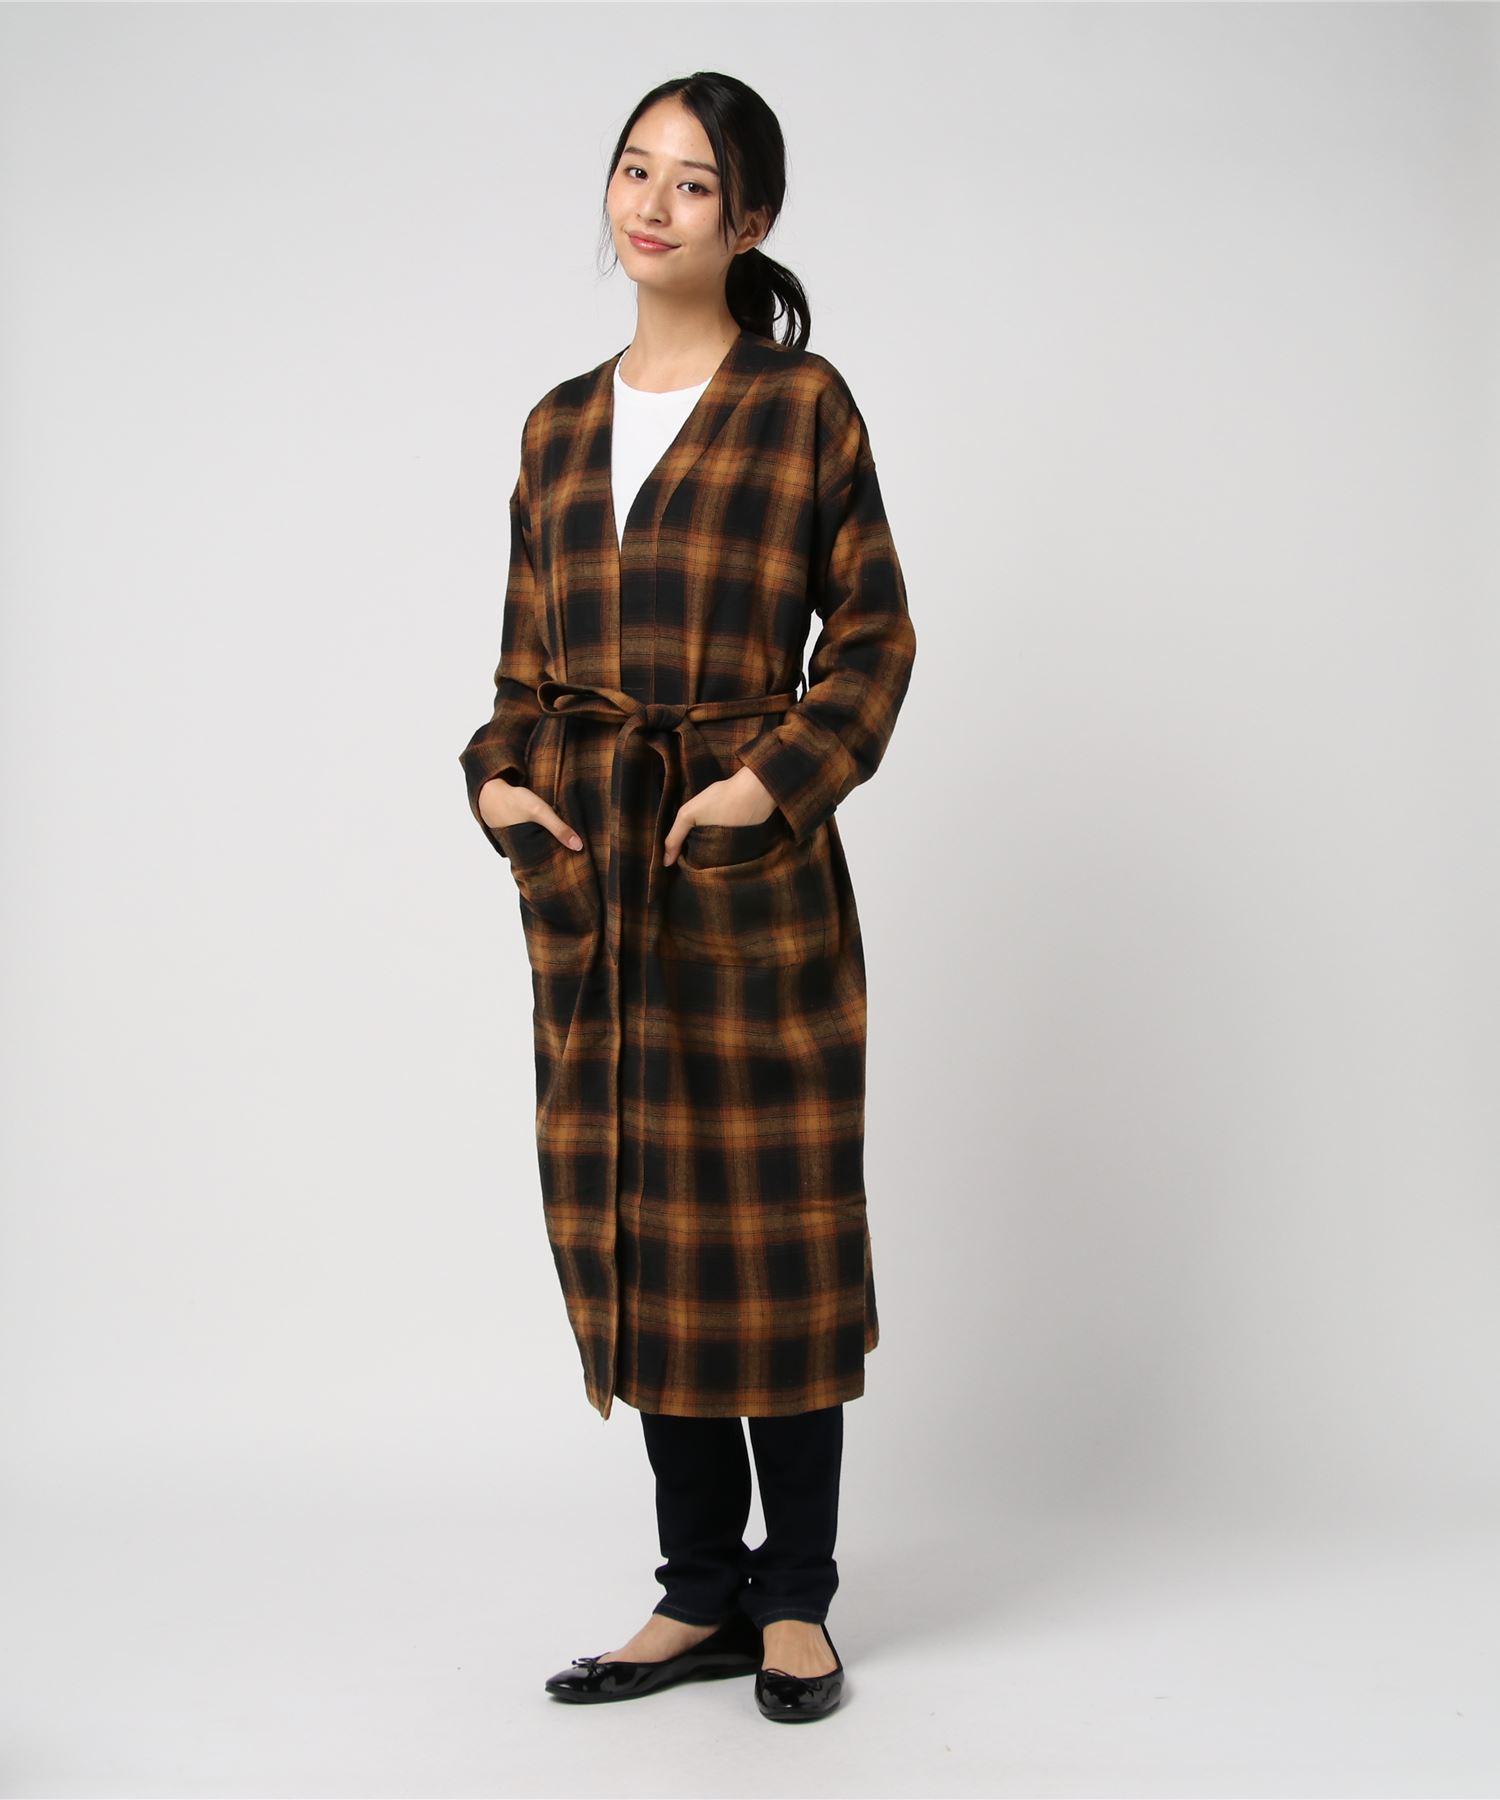 American Rag Cie Plaid Robe Dress/アメリカンラグシー チェックローブドレス